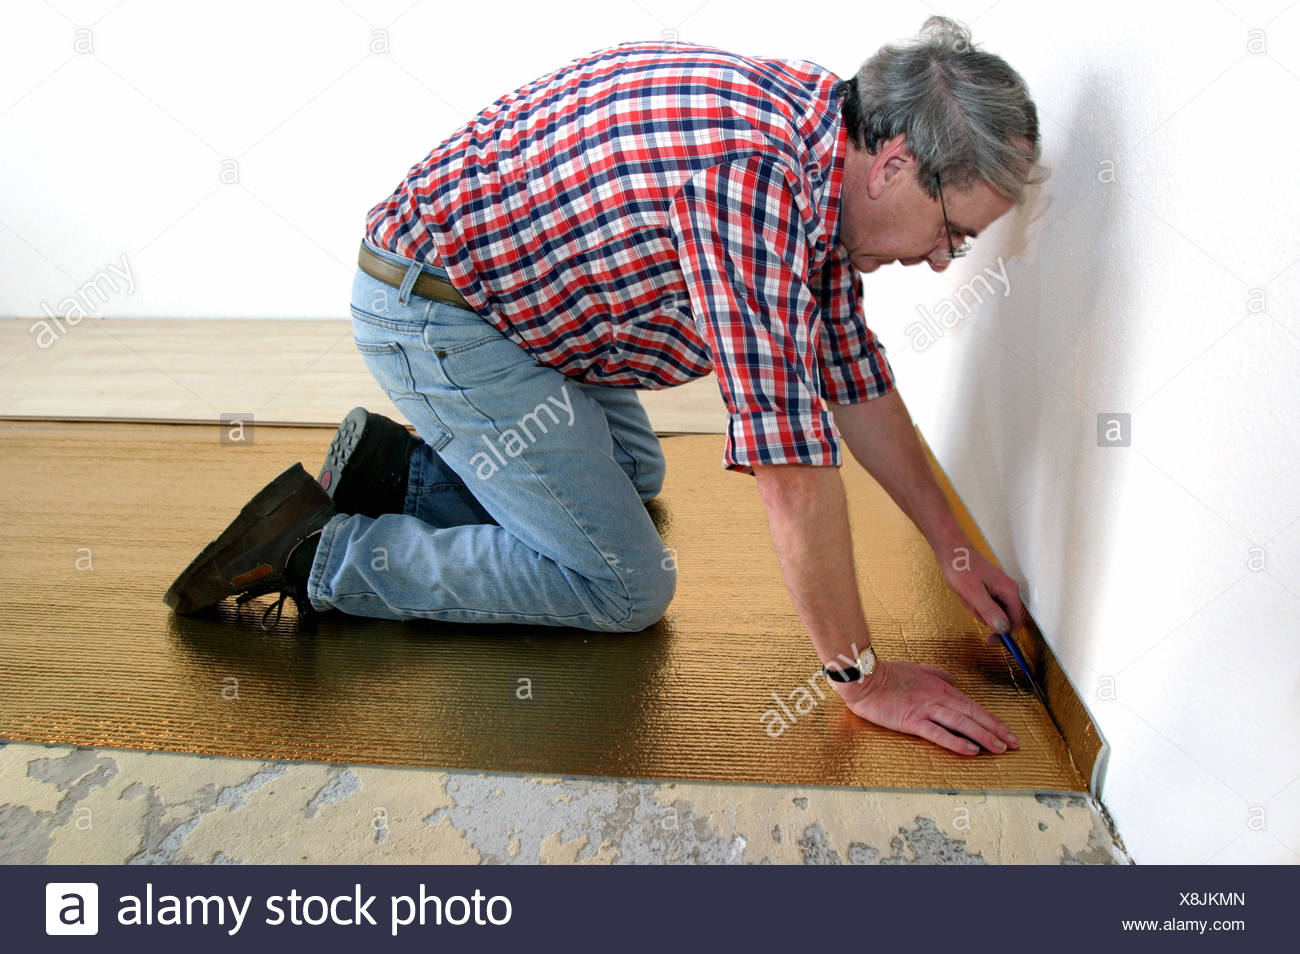 Lay flooring stock photos lay flooring stock images alamy living space floor craftsman stalls lay floor bar attach man 55 solutioingenieria Gallery